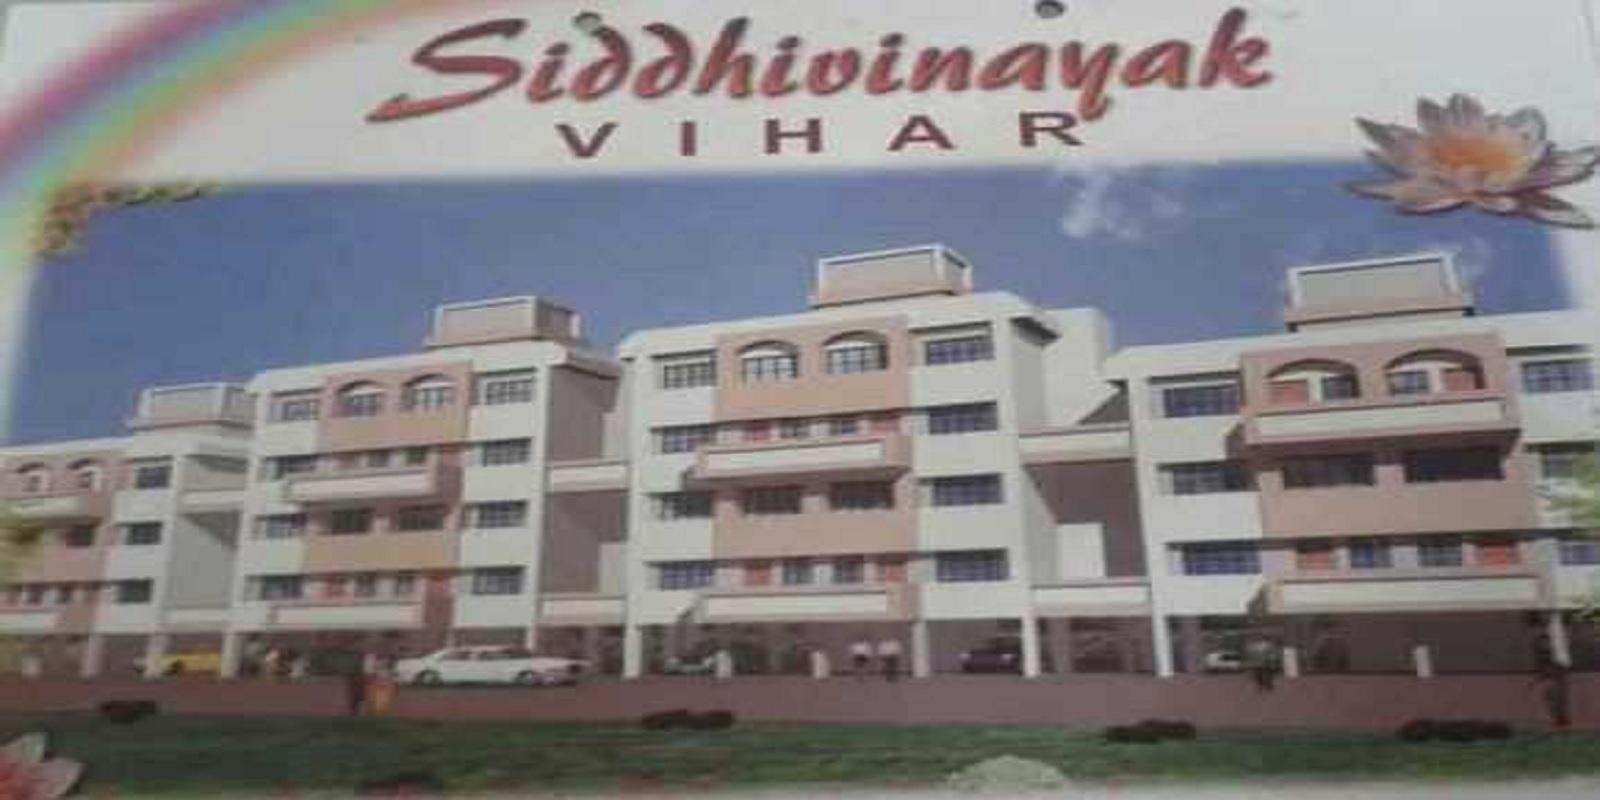 sree mangal siddhivinayak vihar project project large image1